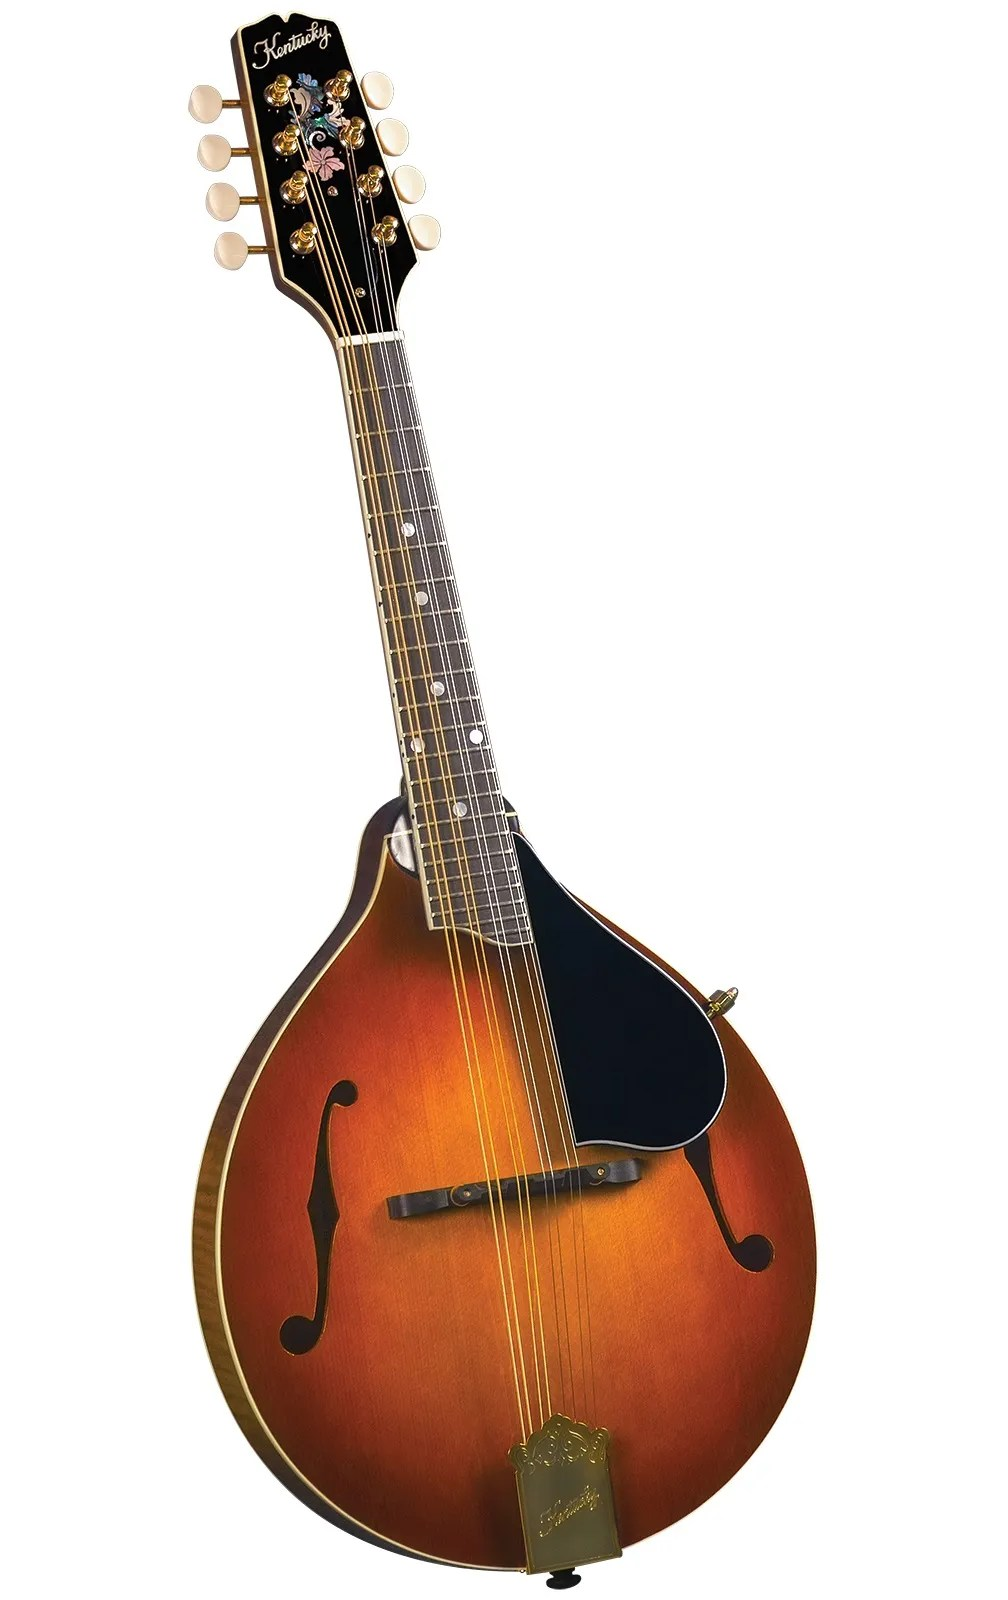 KM-505 saga mandolin summer namm 2016